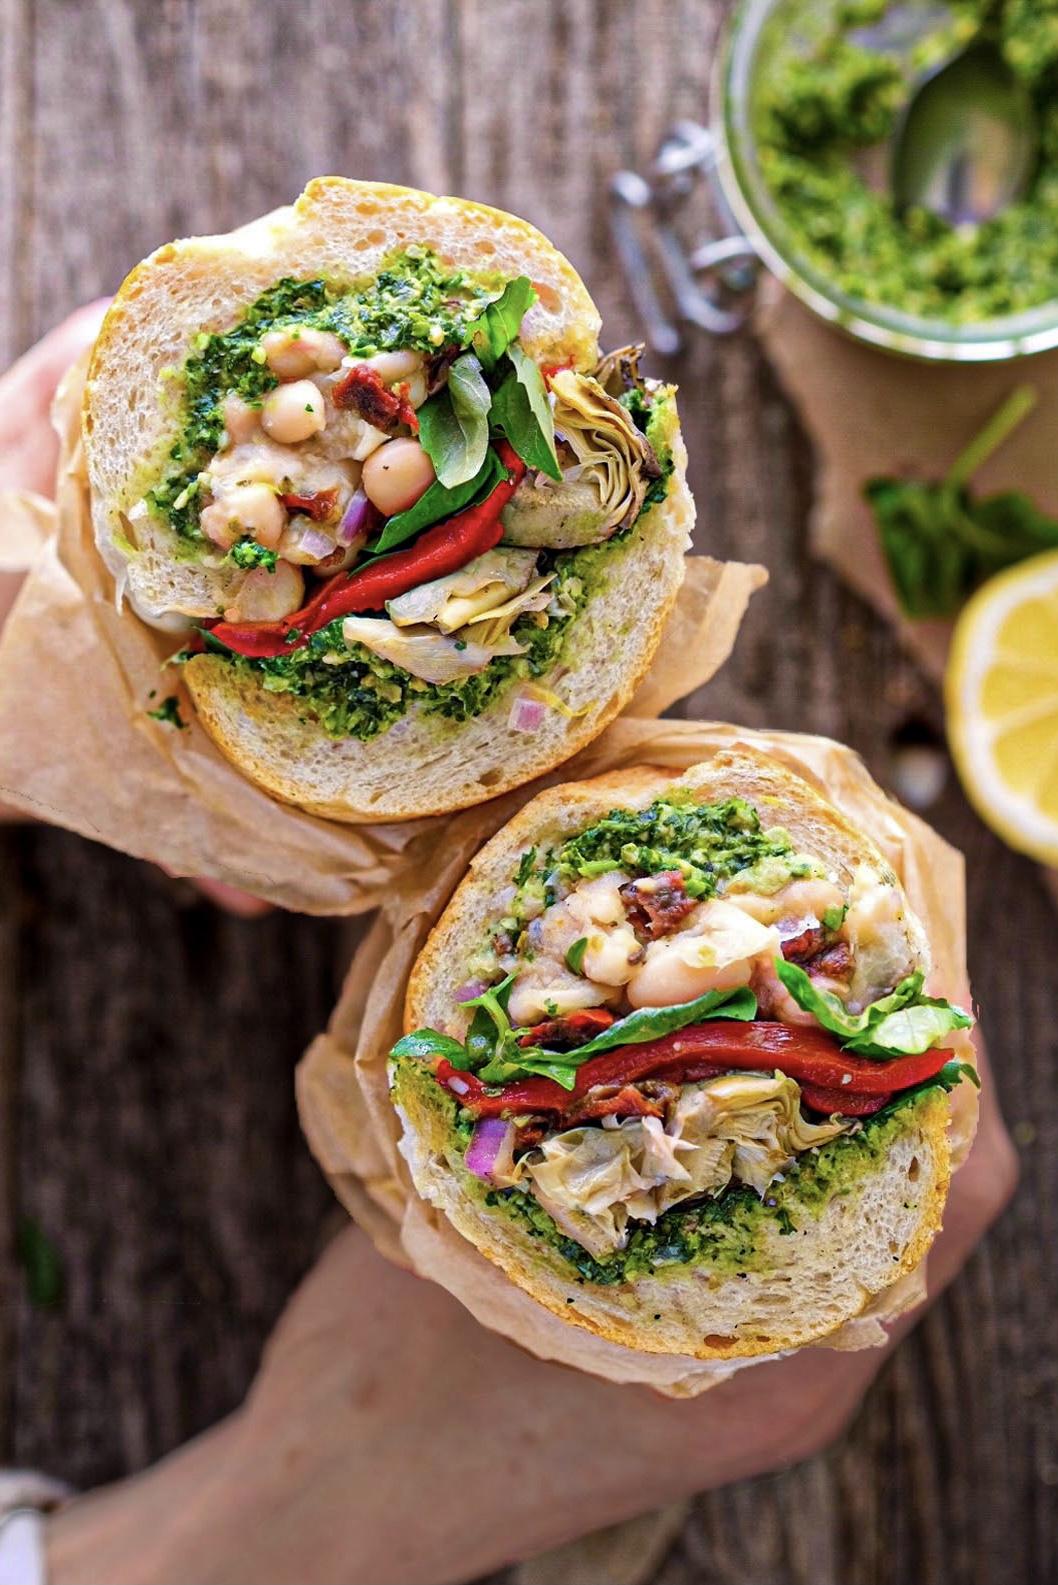 Vegan Antipasto Sandwich with Marinated White Beans